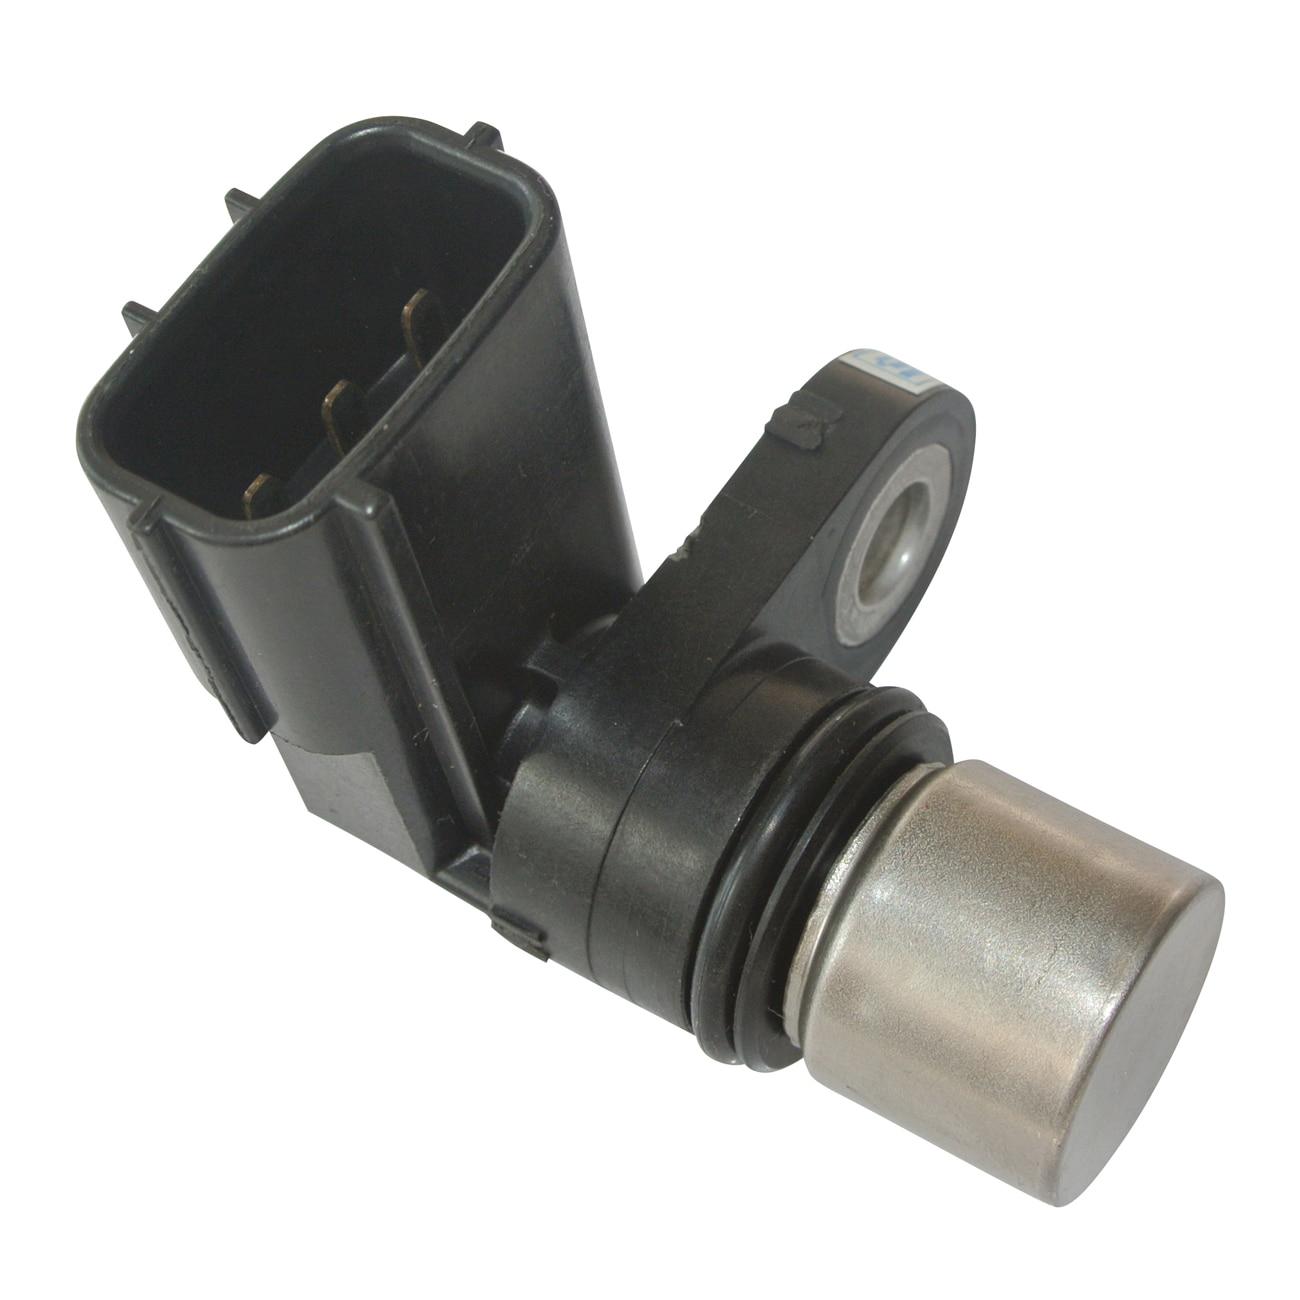 Manual Trans Speed Sensor WELLS SU13933 Fits 04 08 Acura